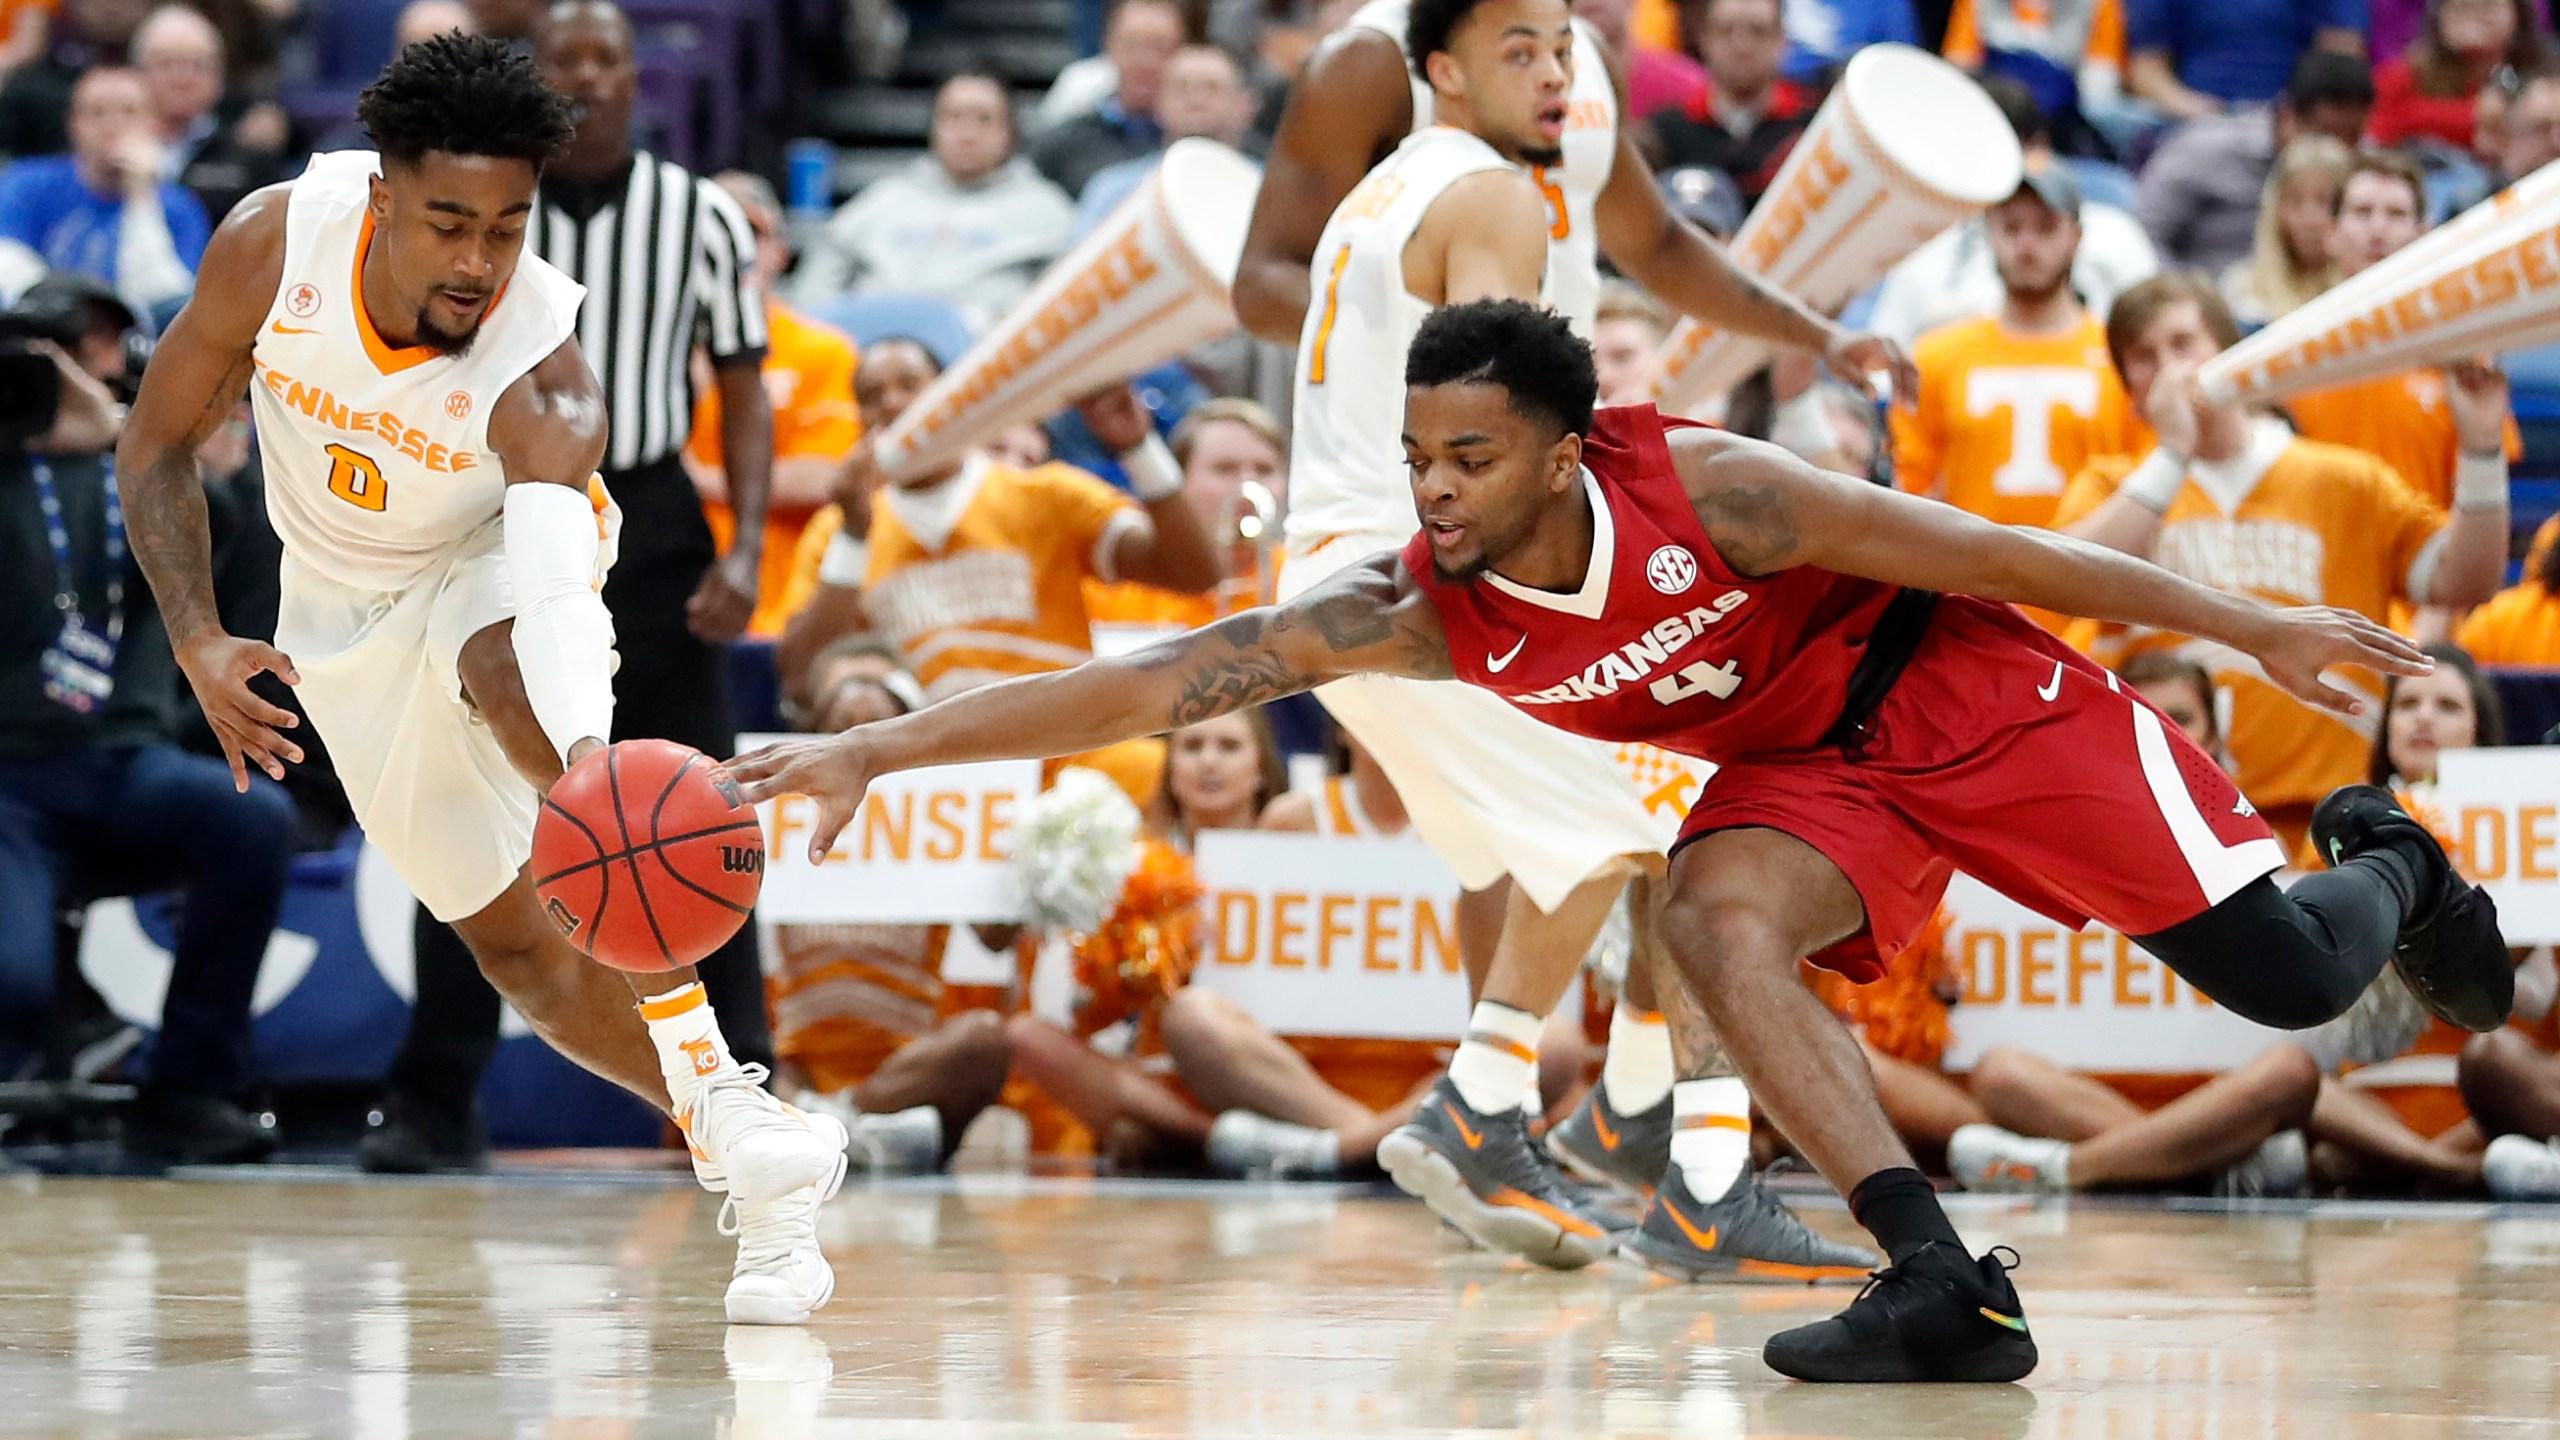 APTOPIX SEC Arkansas Tennessee Basketball_493355